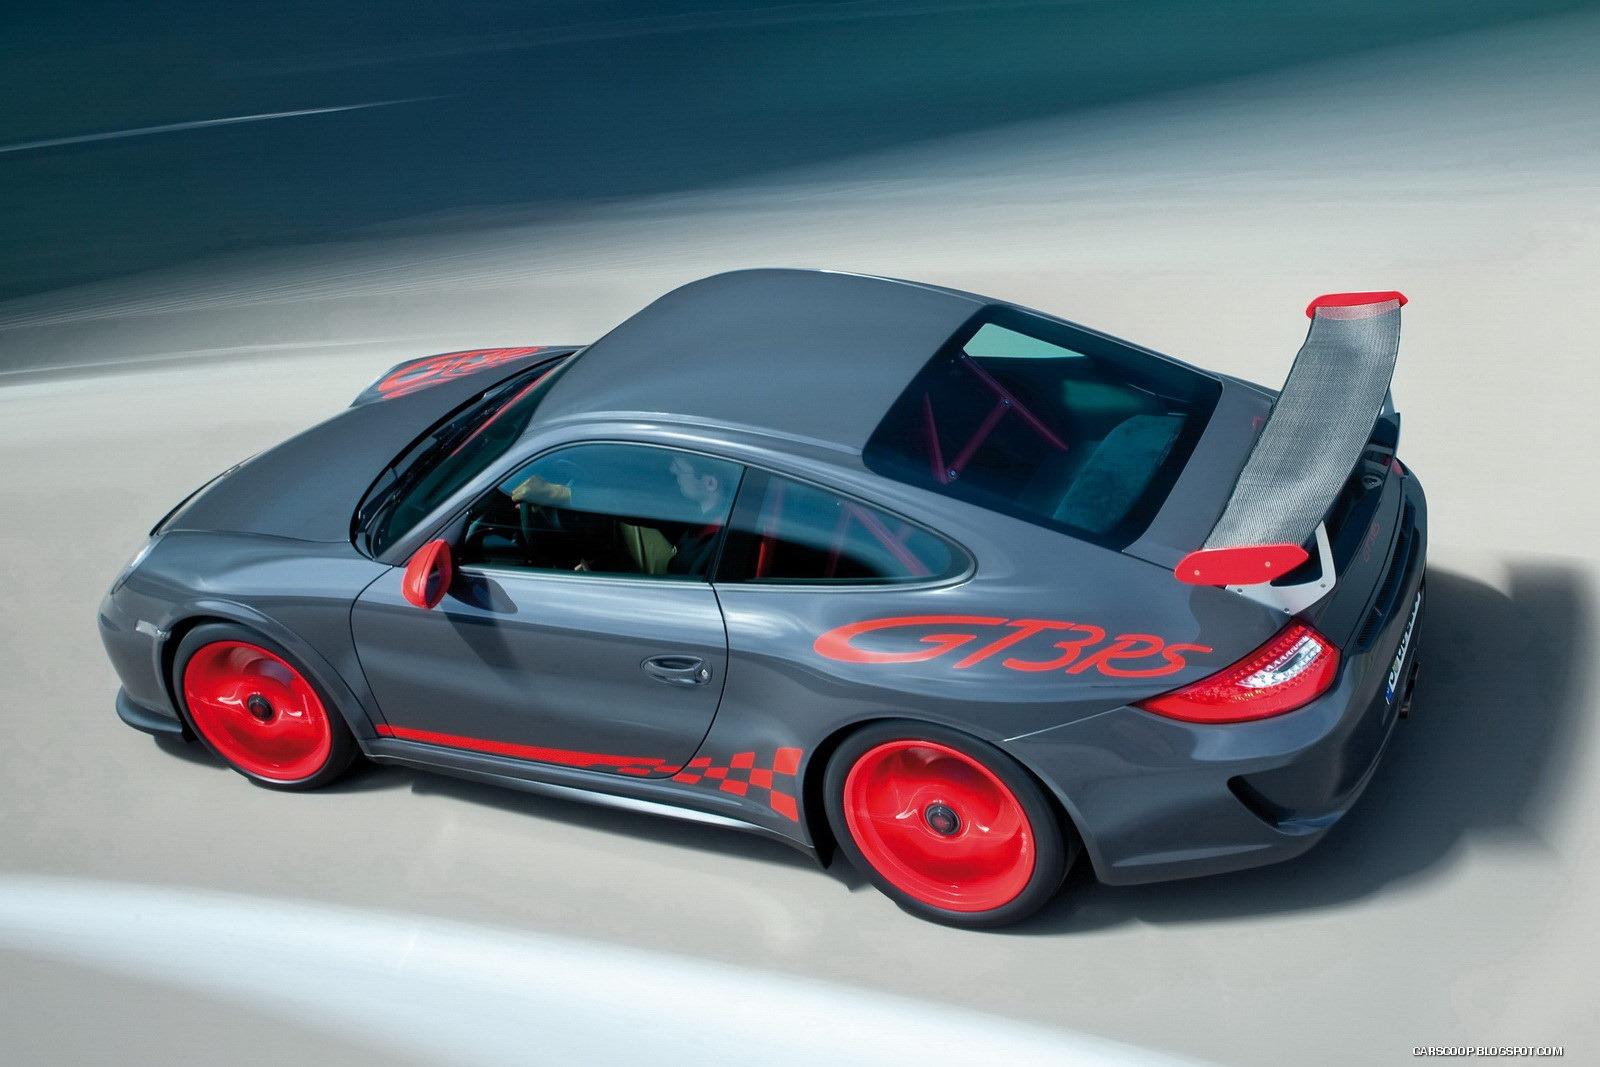 wallpaper hd porsche 911 gt3 rs 2014 cars radar. Black Bedroom Furniture Sets. Home Design Ideas